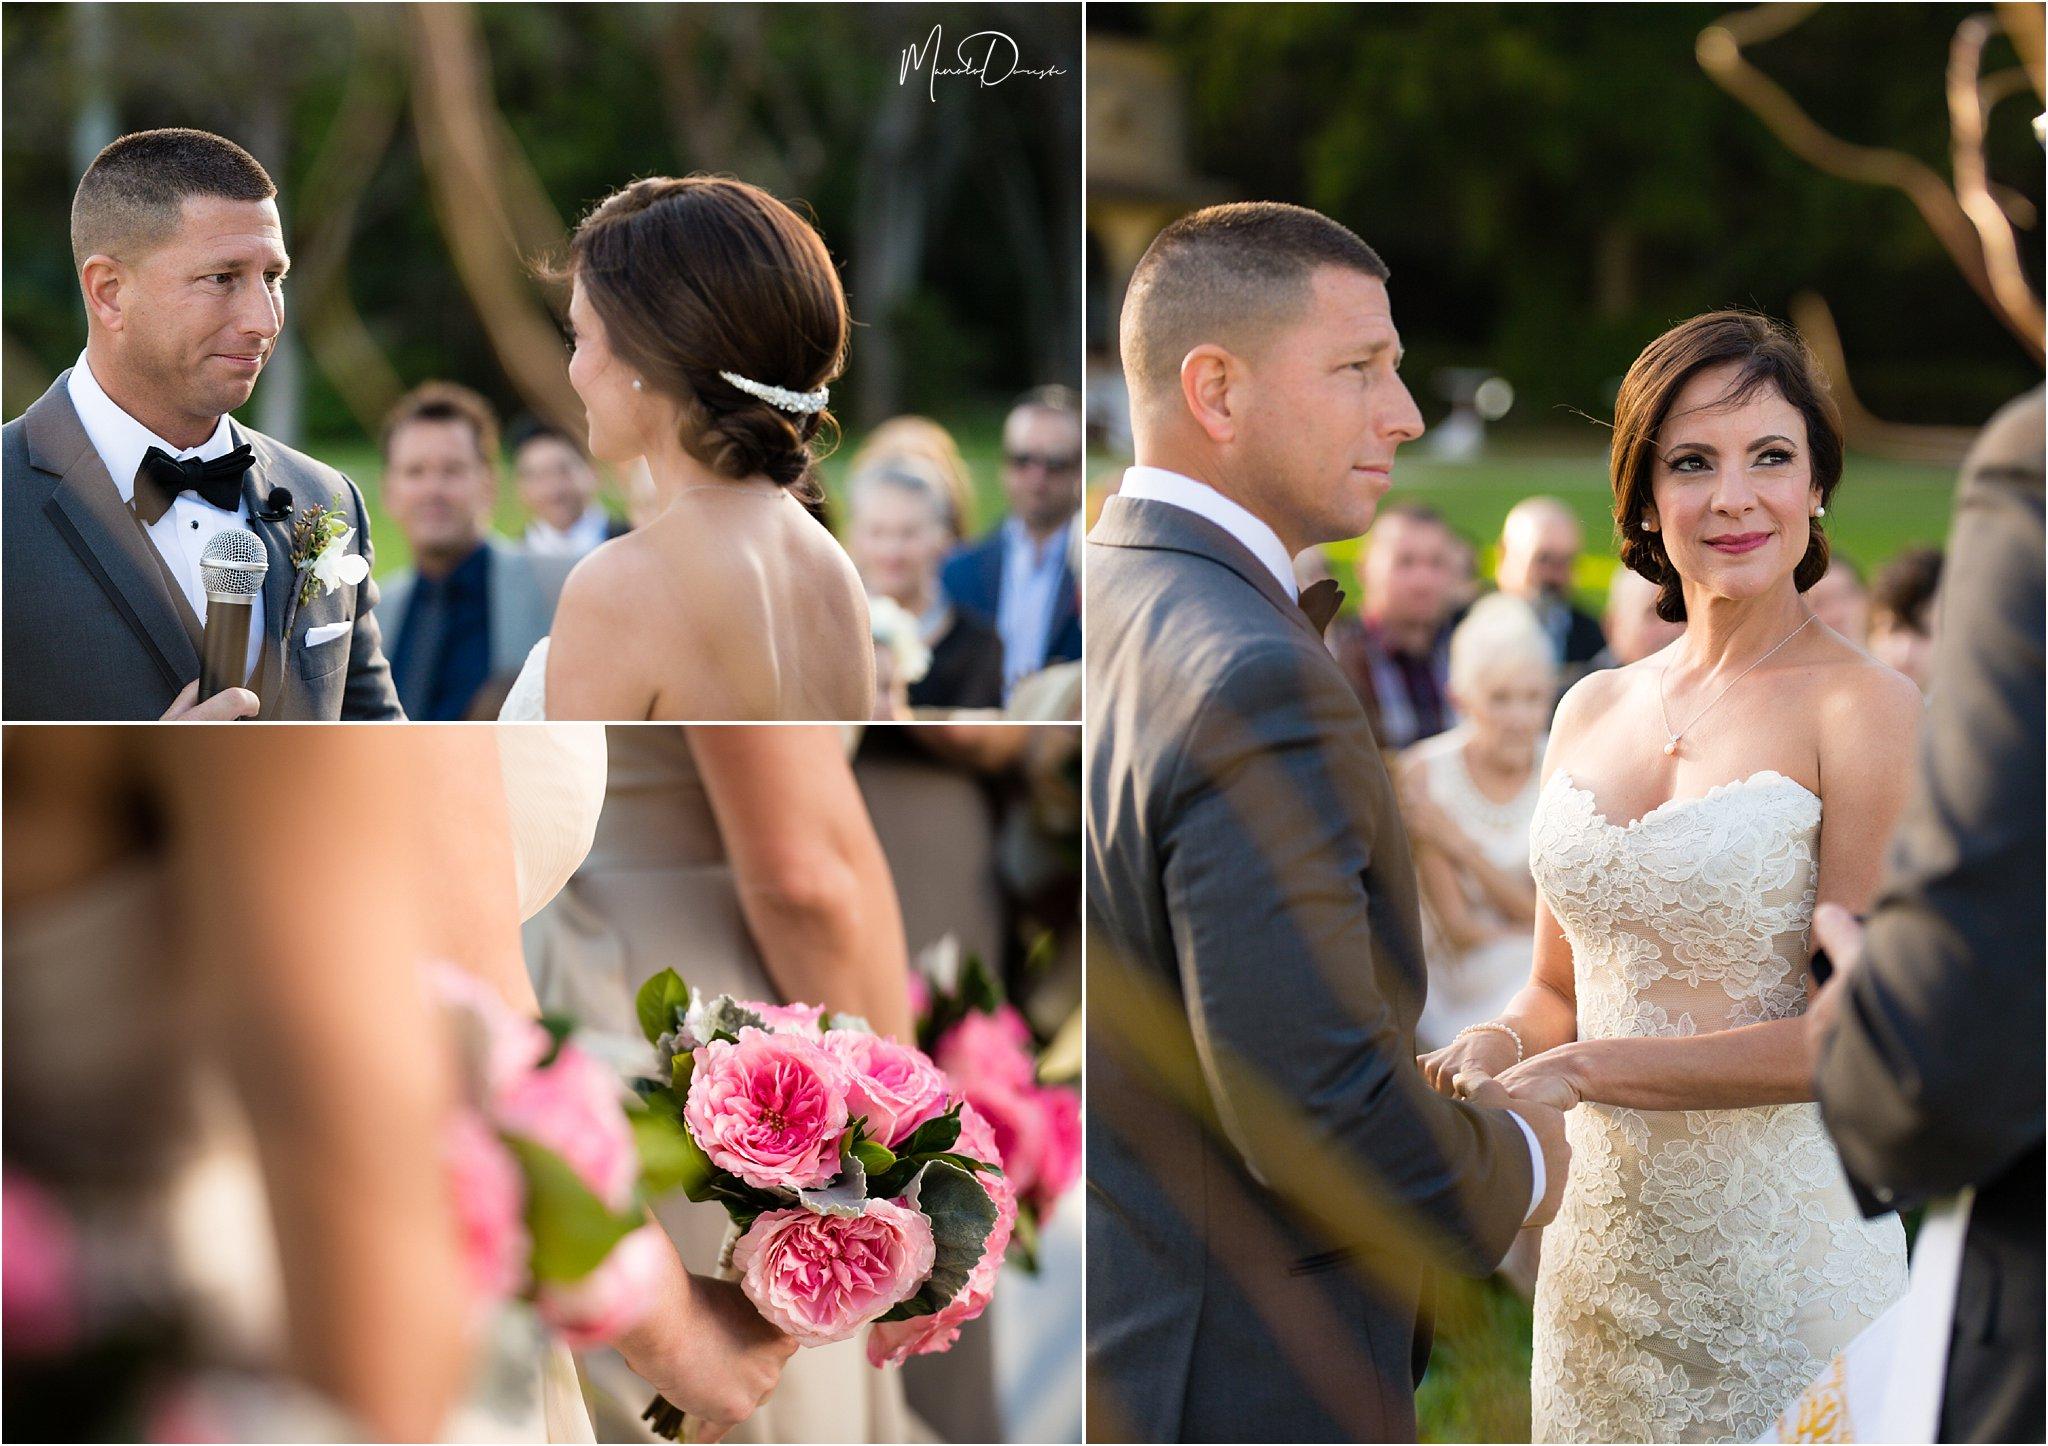 00840_ManoloDoreste_InFocusStudios_Wedding_Family_Photography_Miami_MiamiPhotographer.jpg